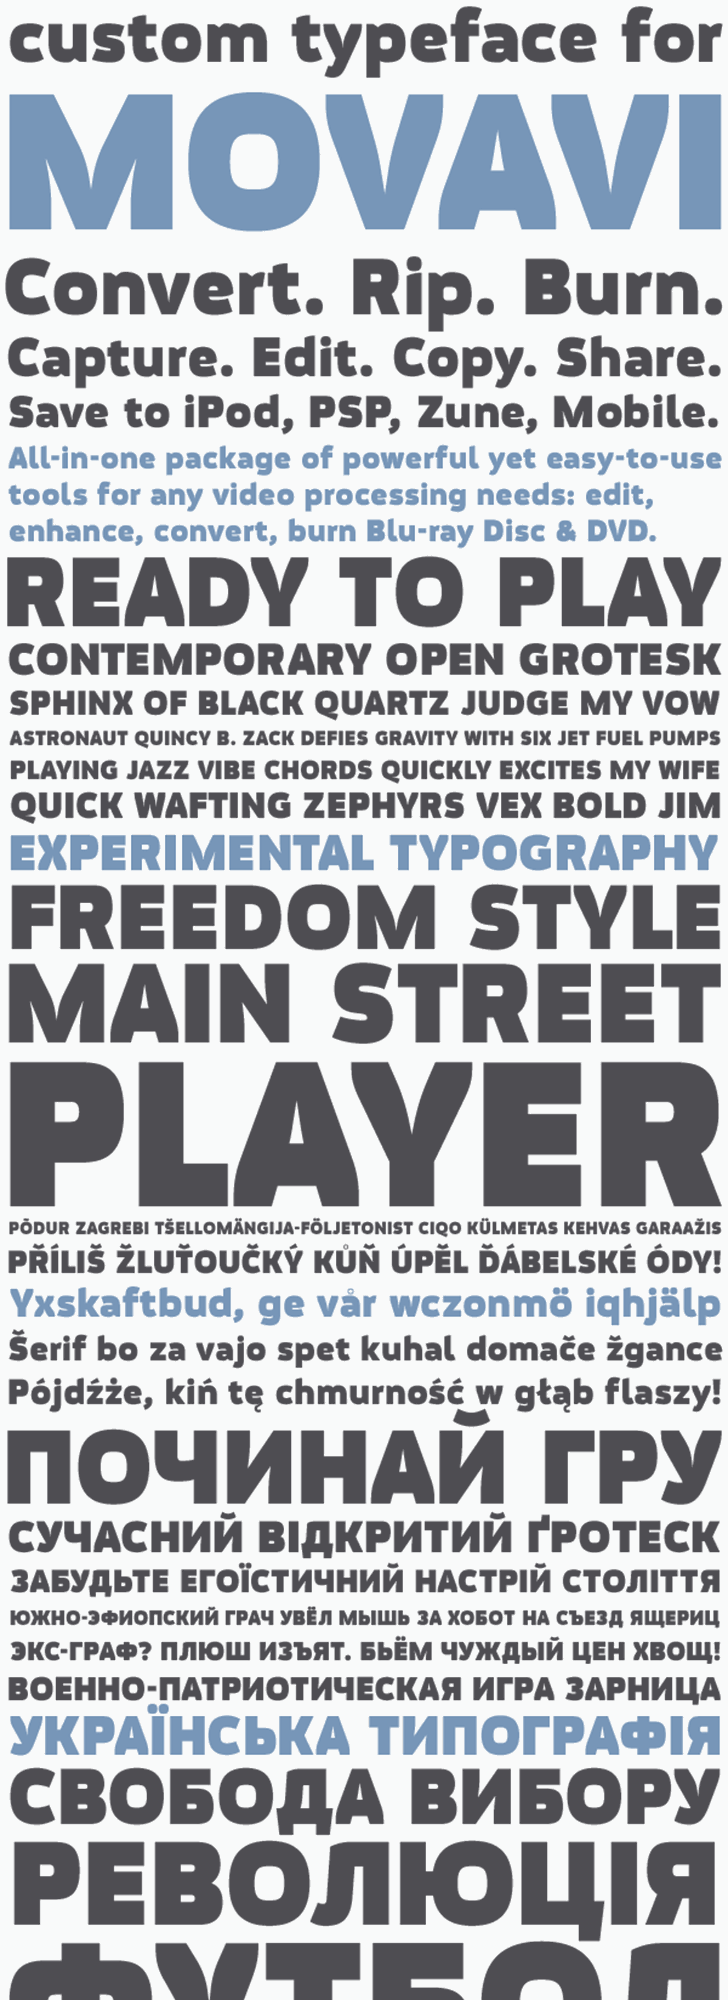 Movavi Grotesque Black Font text newspaper